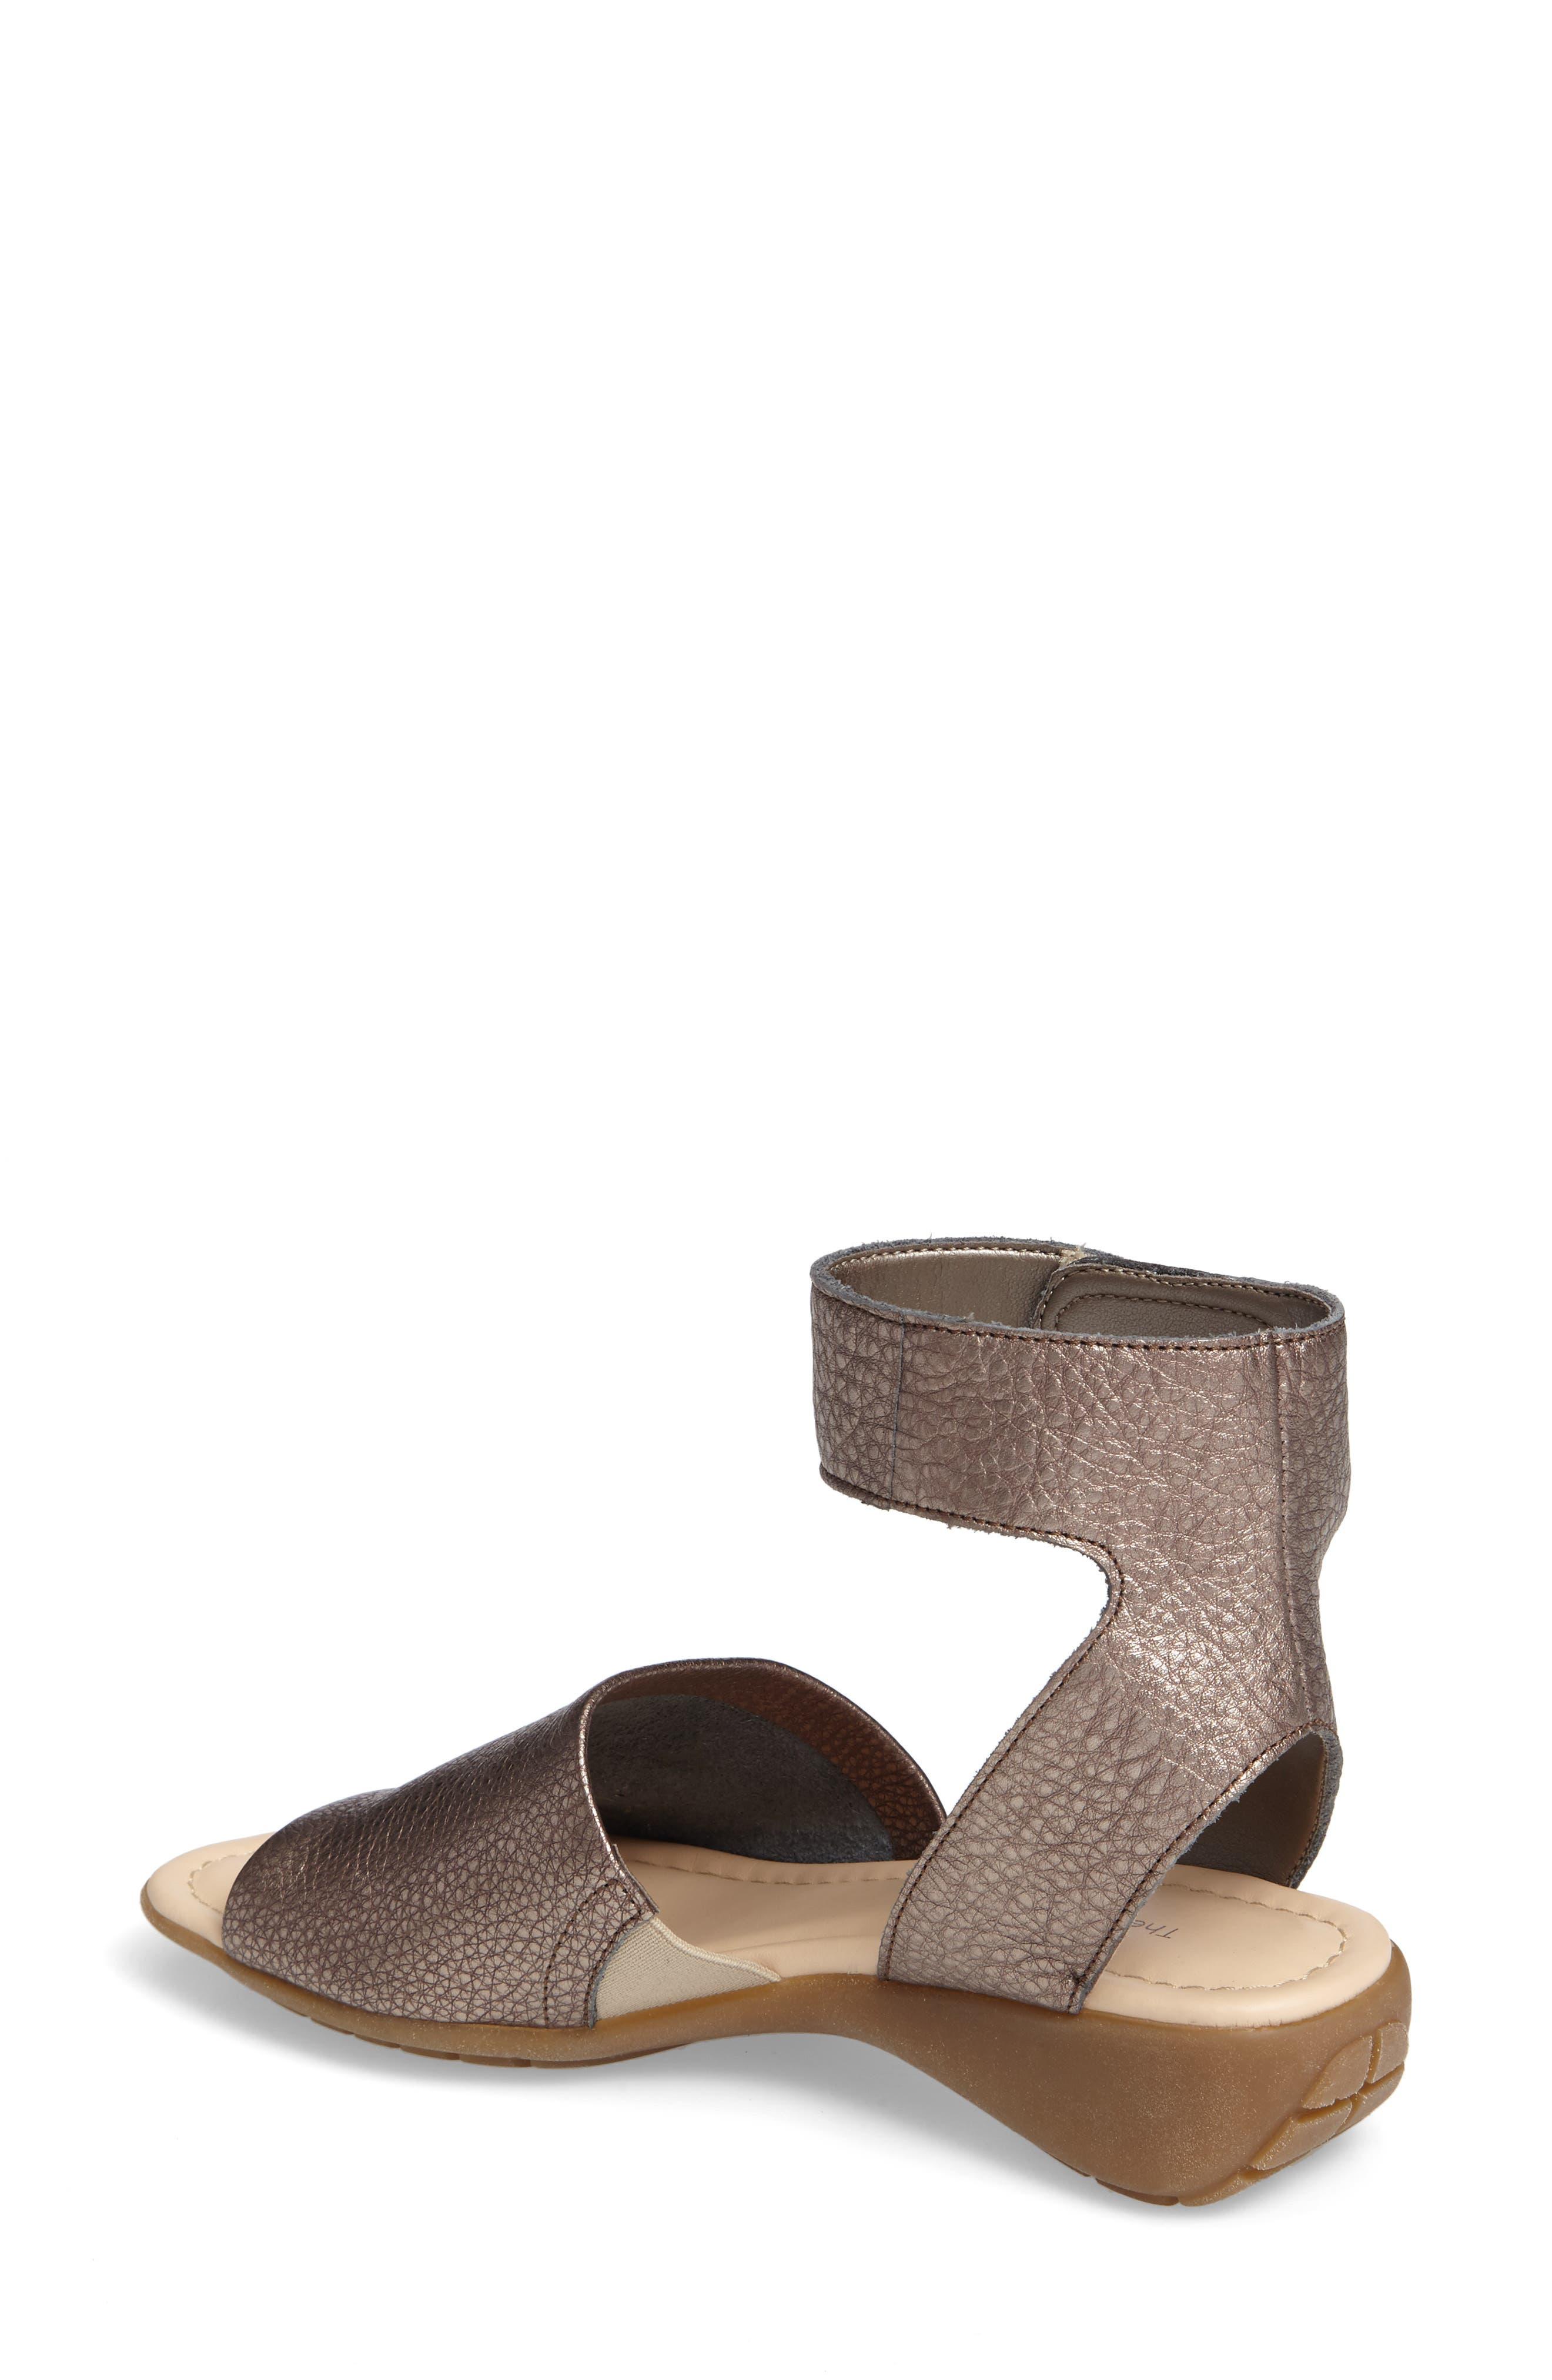 'Beglad' Leather Ankle Strap Sandal,                             Alternate thumbnail 23, color,